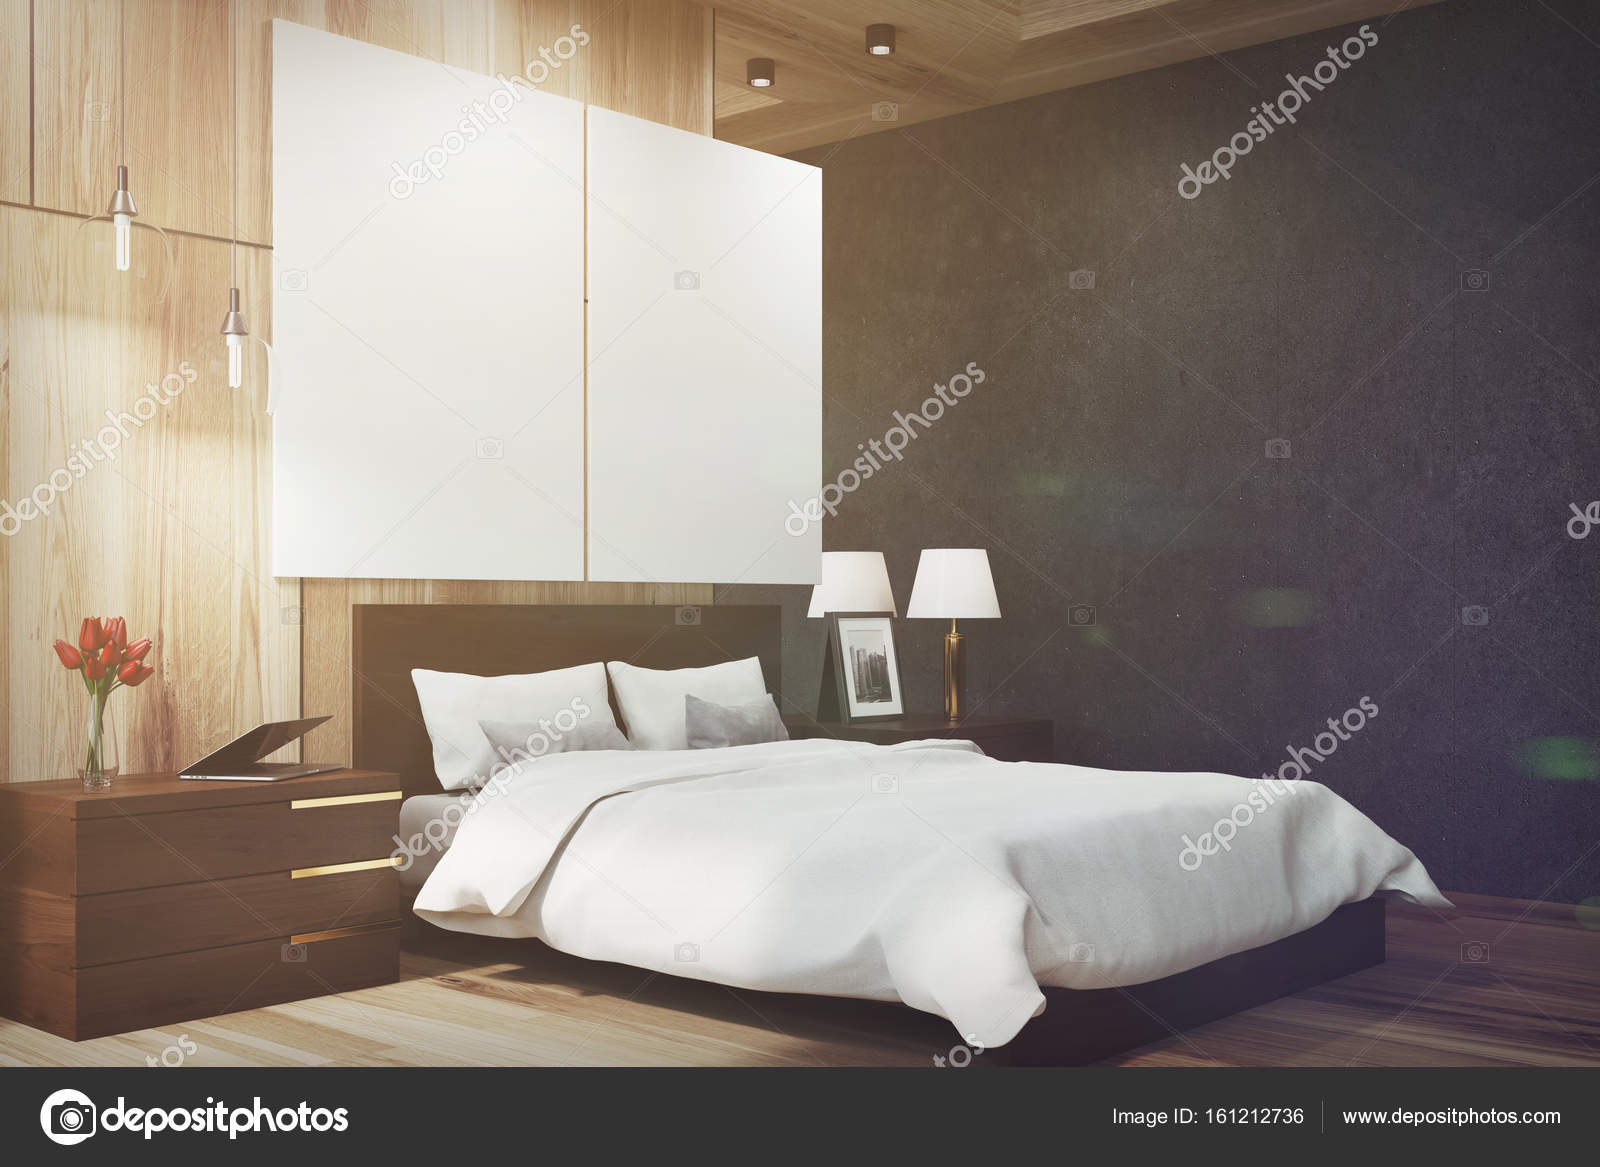 https://st3.depositphotos.com/2673929/16121/i/1600/depositphotos_161212736-stockafbeelding-zwart-en-houten-slaapkamer-posters.jpg